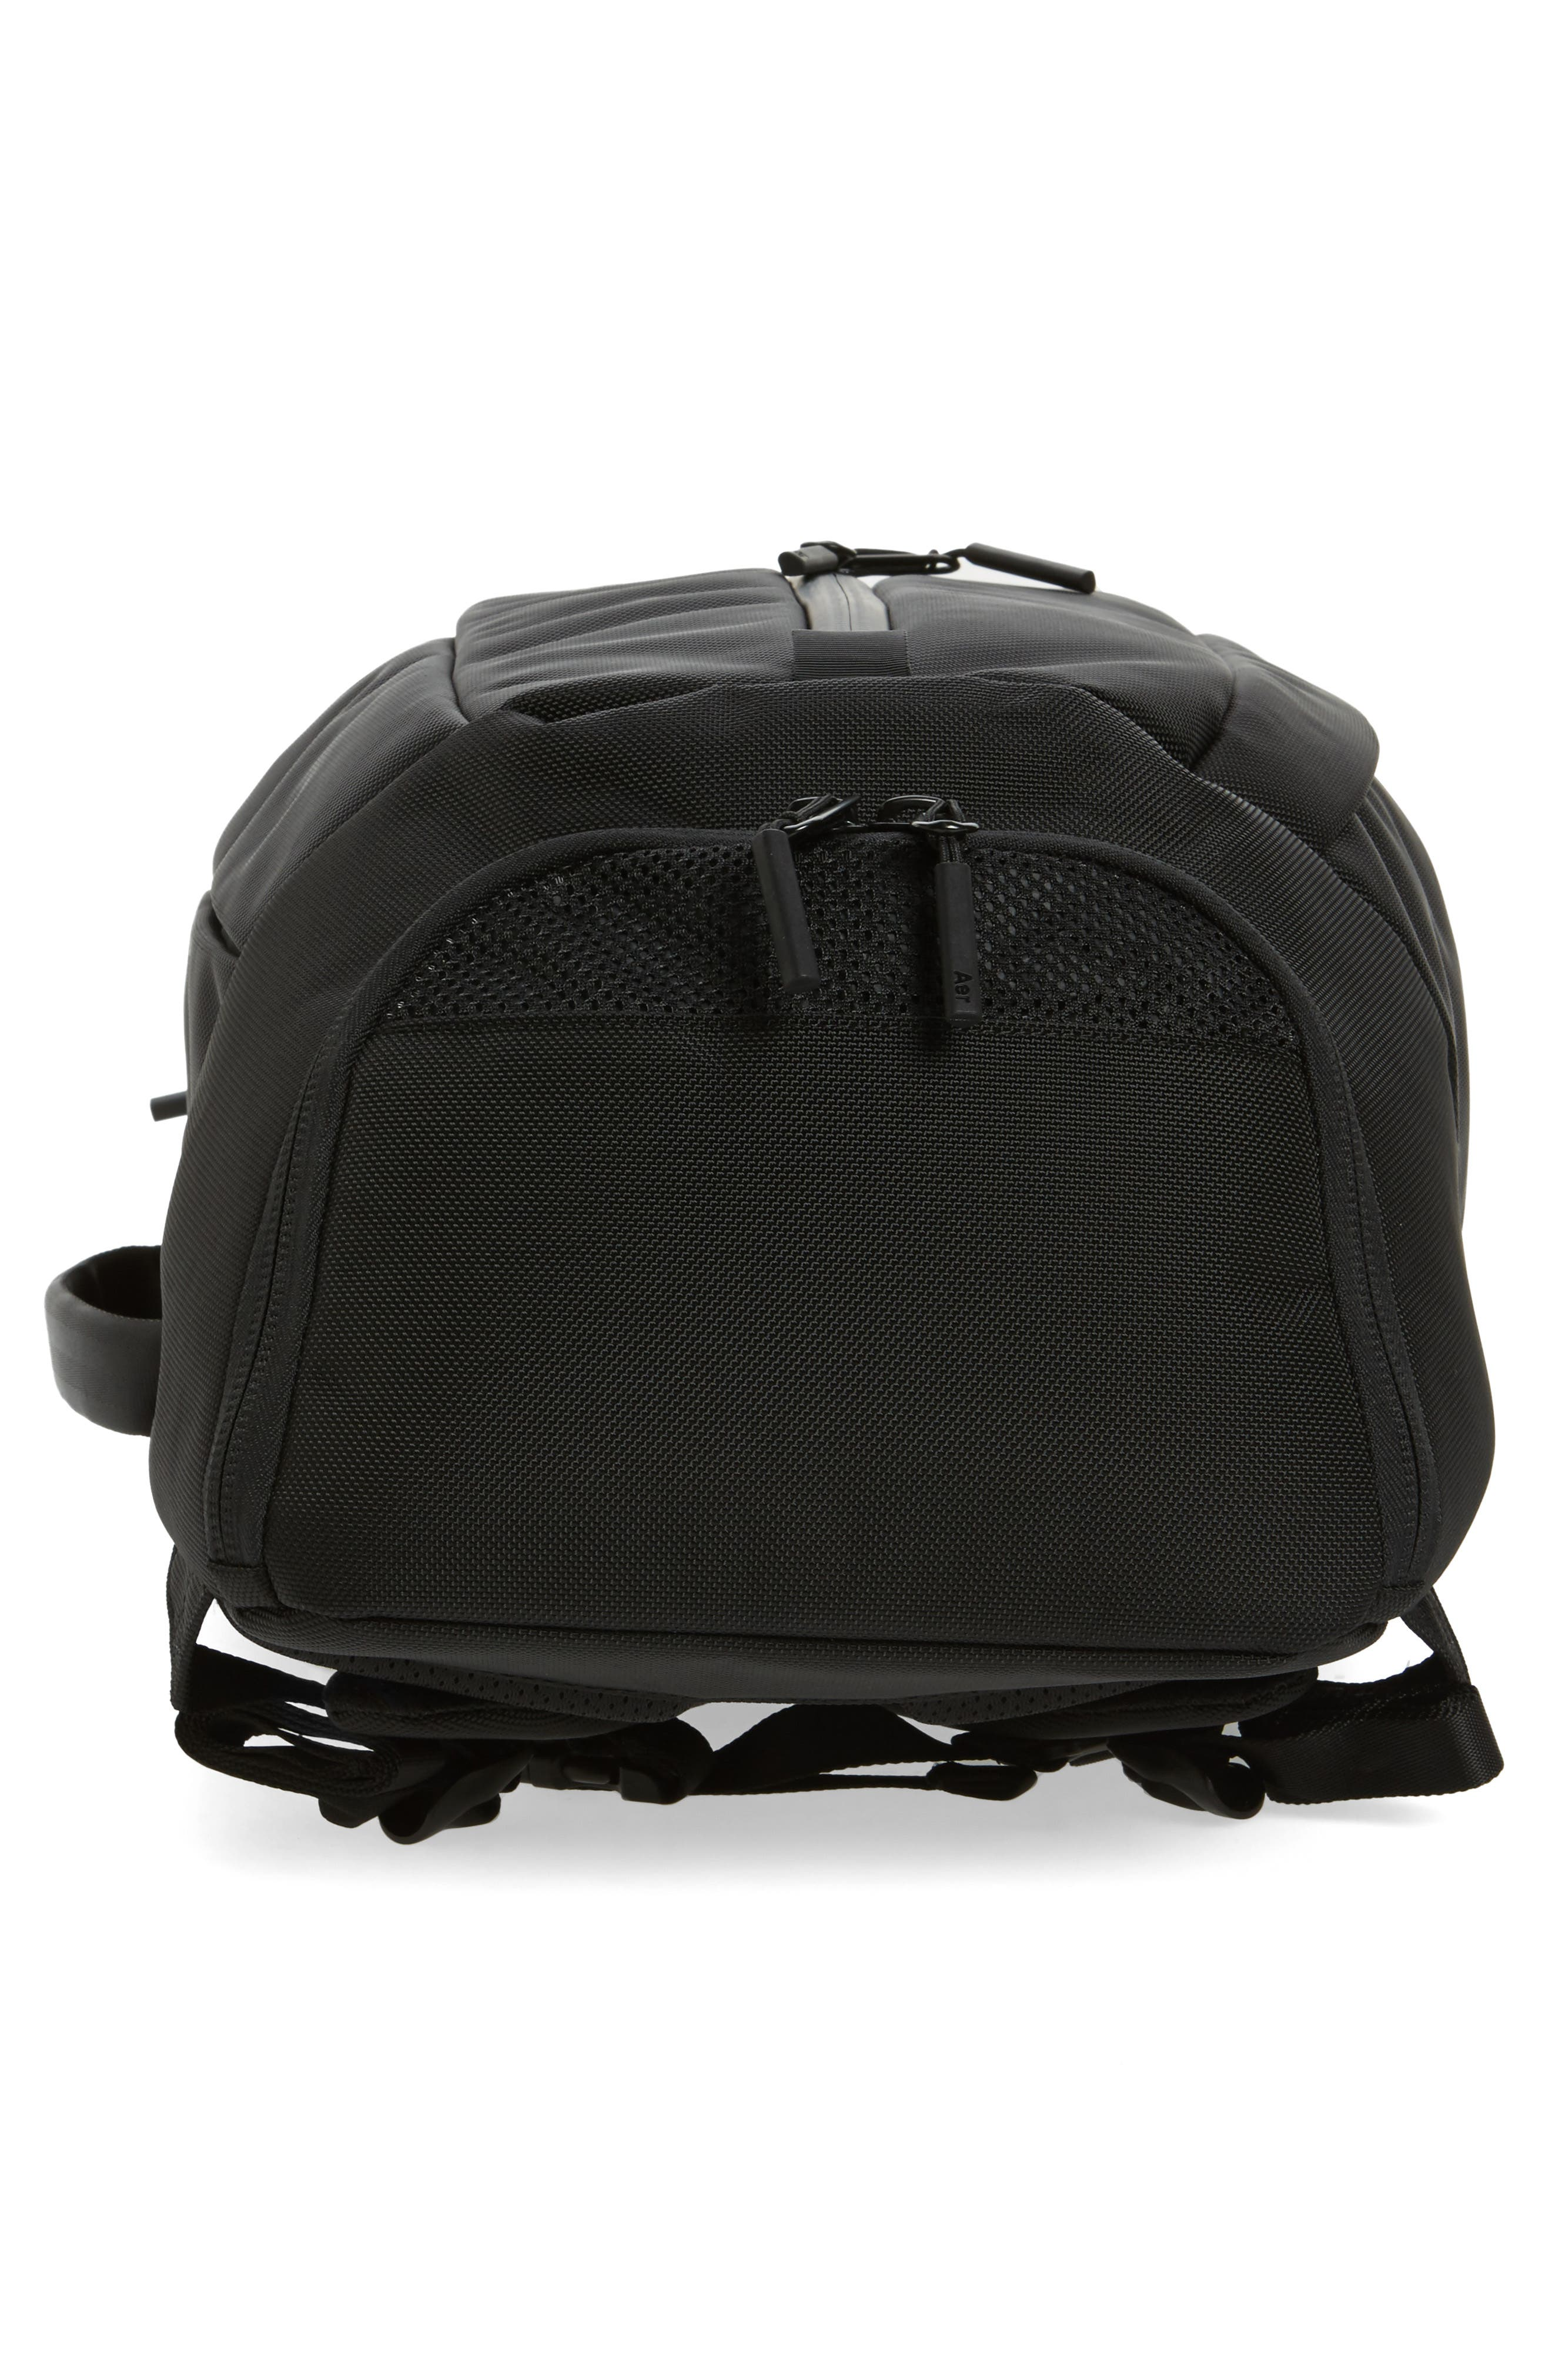 Duffel Pack 2 Convertible Backpack,                             Alternate thumbnail 6, color,                             BLACK